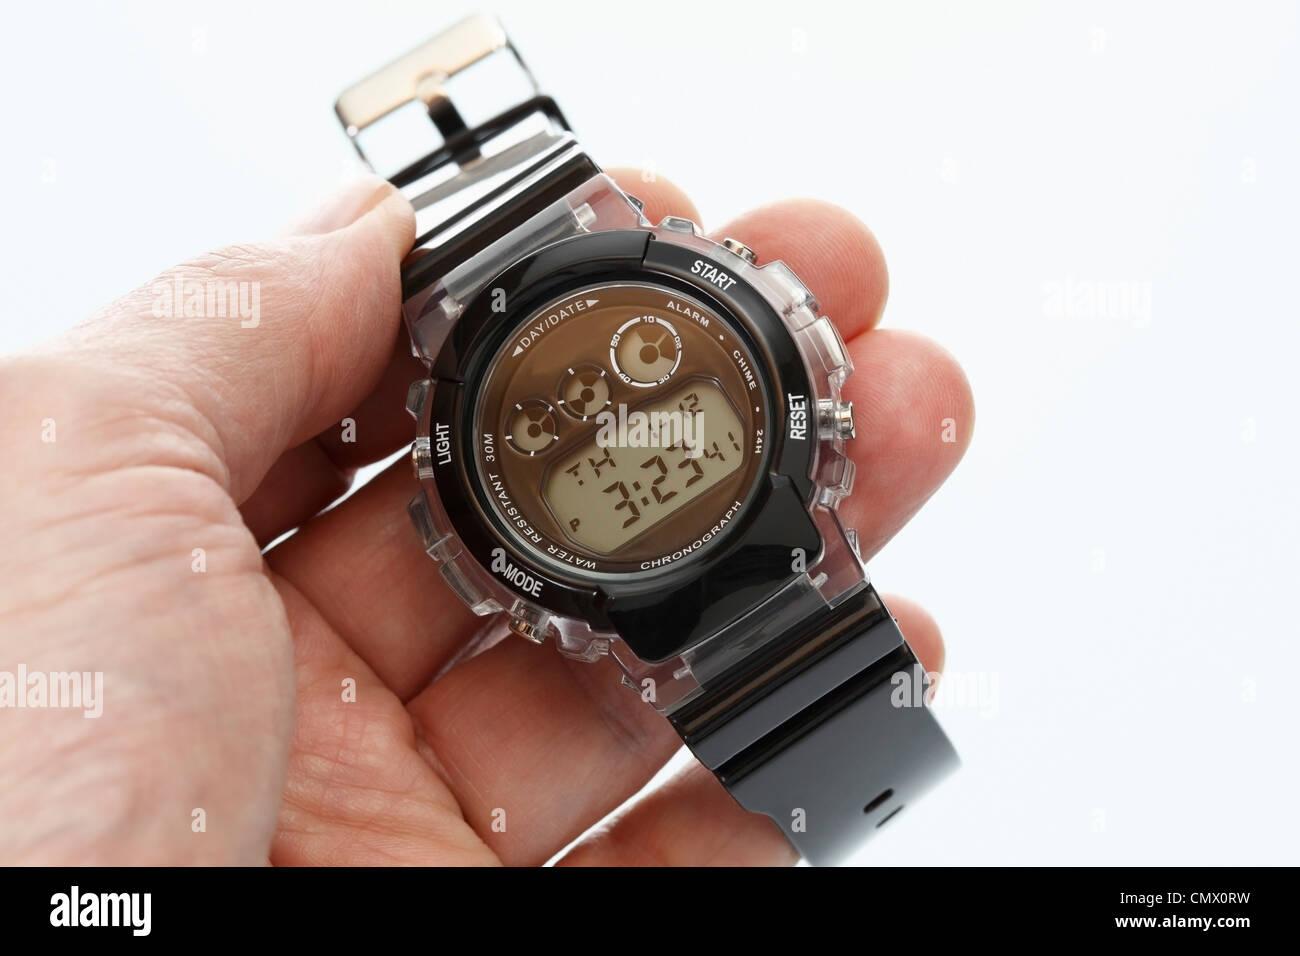 La mano humana la celebración de reloj de pulsera, cerrar Imagen De Stock